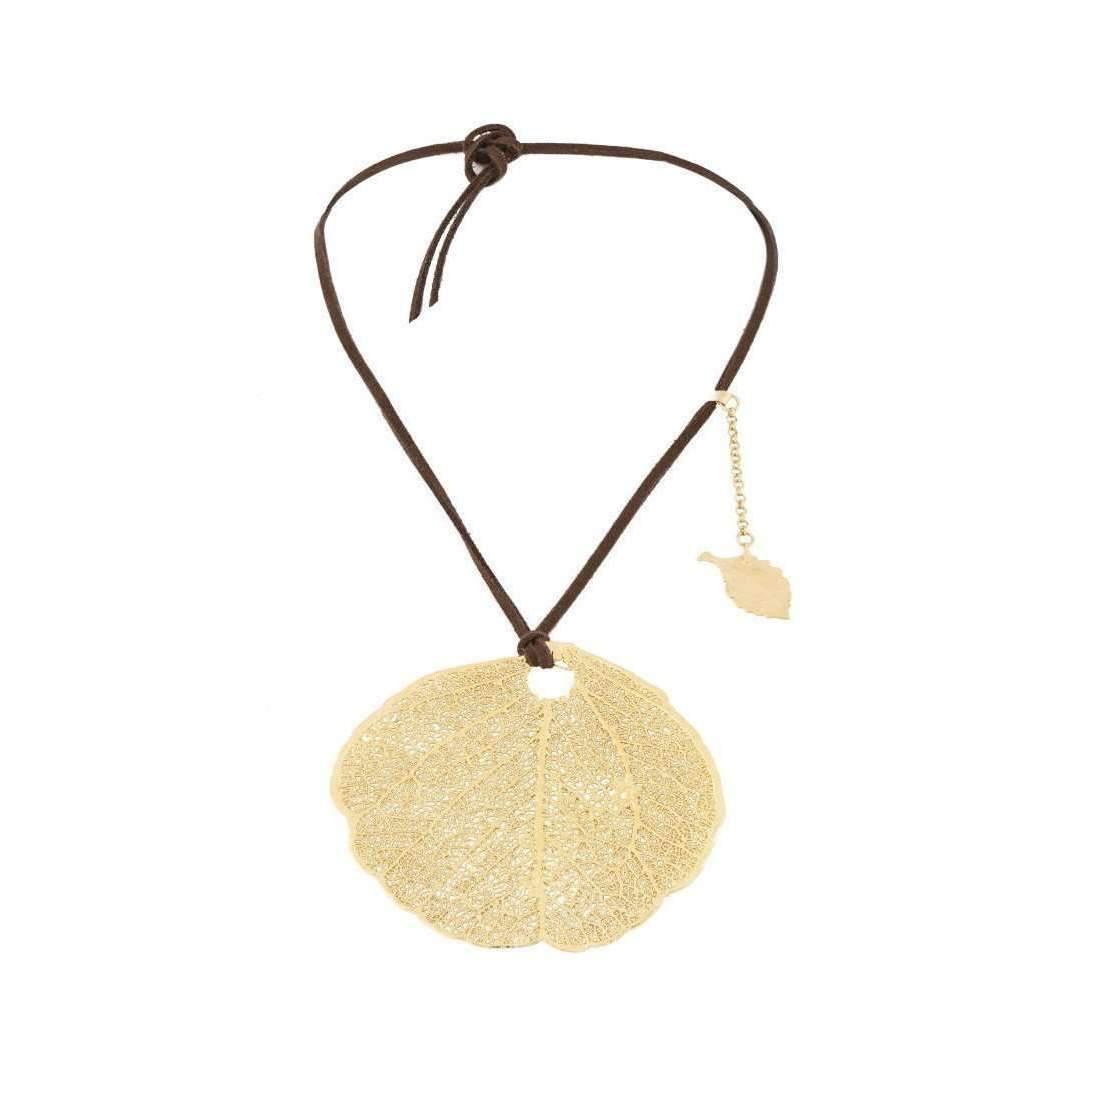 Amazona Secrets 18kt Gold & Quartz Savannah Leaf Necklace kMI05q